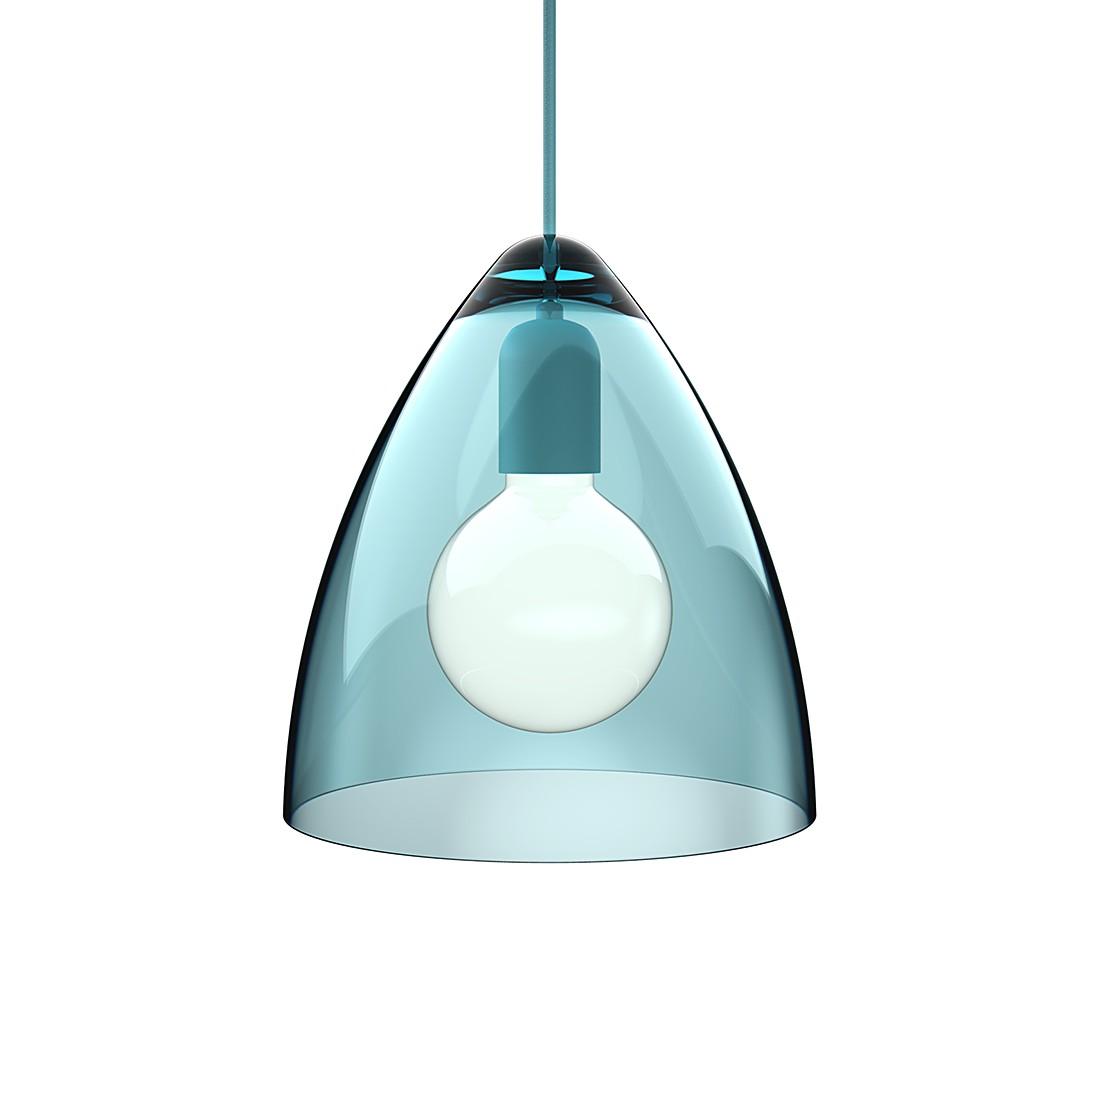 Pendelleuchte Funk - Acrylglas-Textil - Transparent Tuerkis-Tuerkis - Durchmesser 27 cm, Nordlux